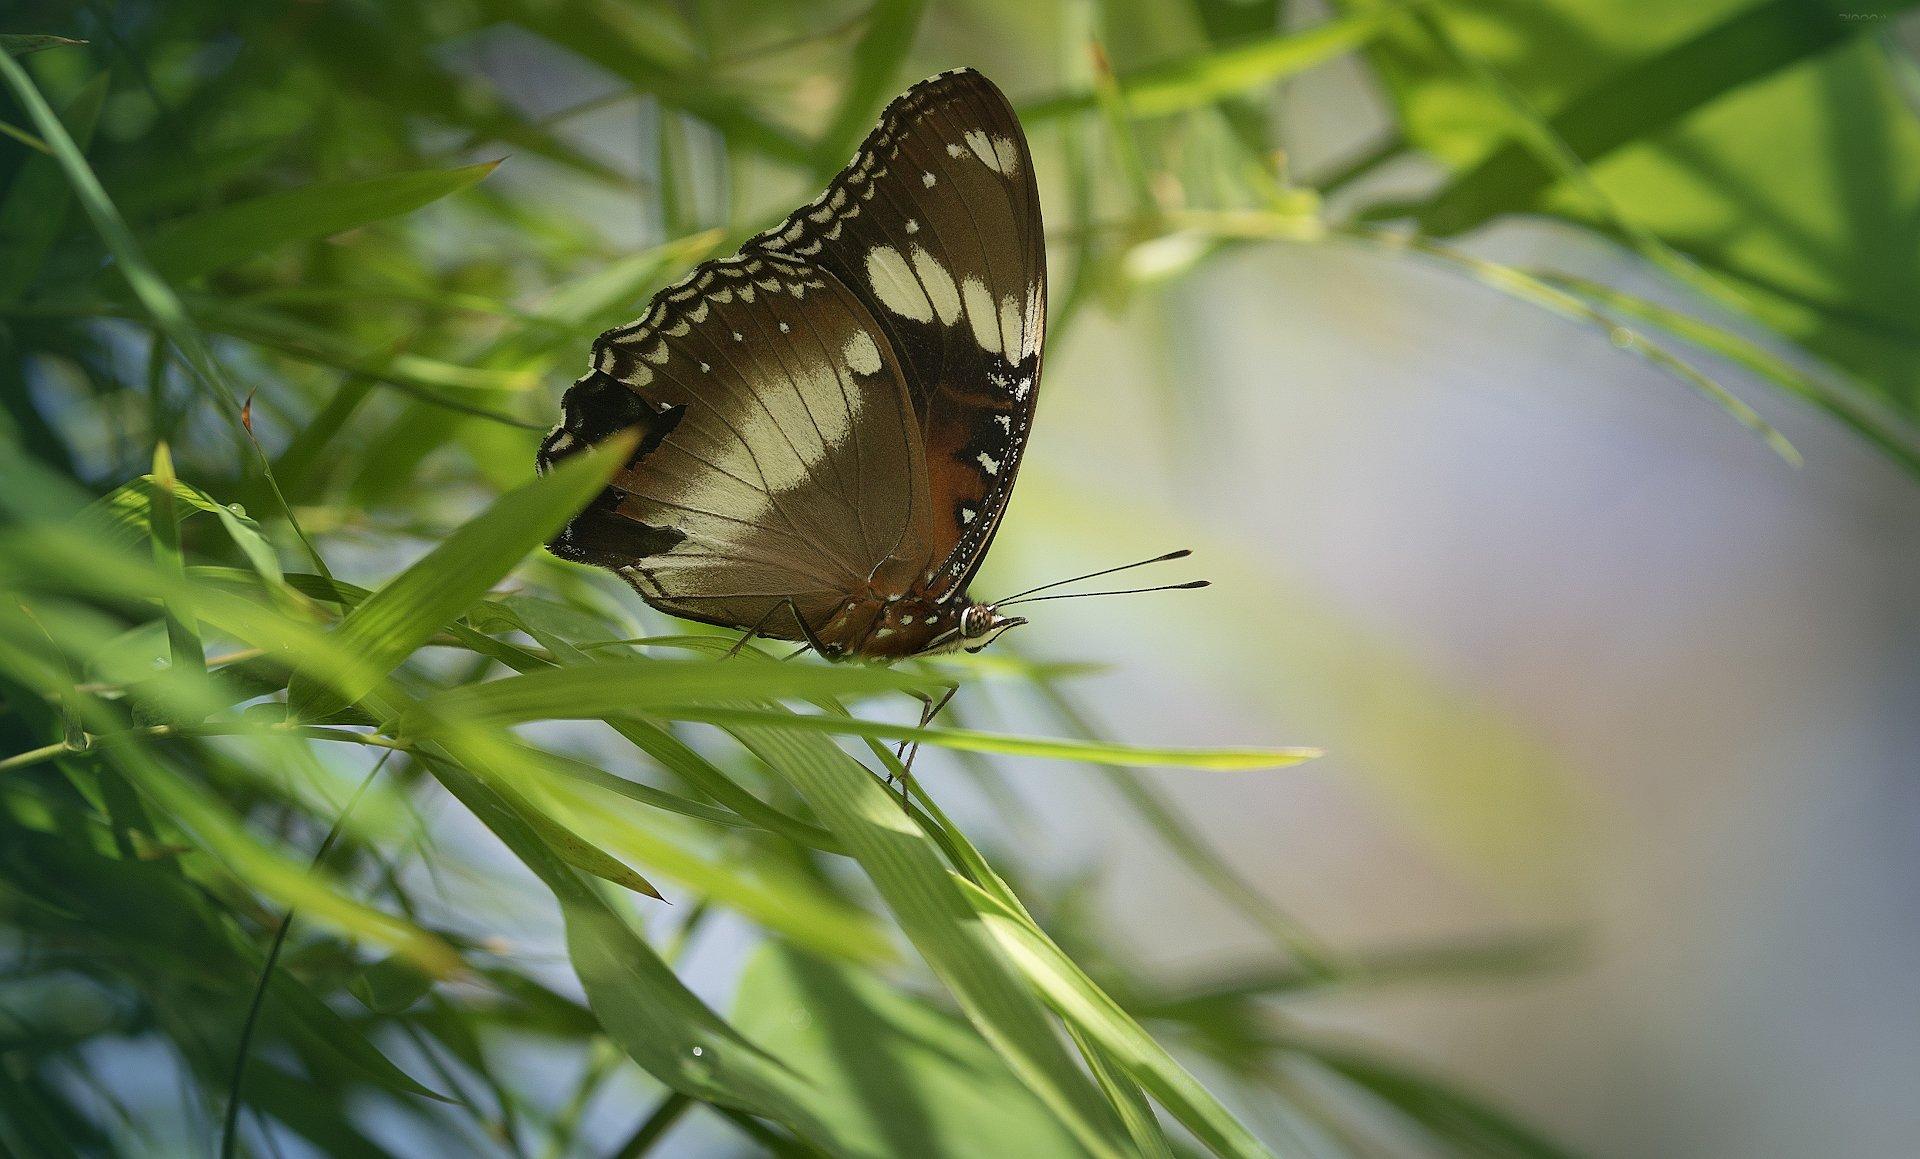 природа, бабочки, макро, индонезия, Дмитрий Посевич